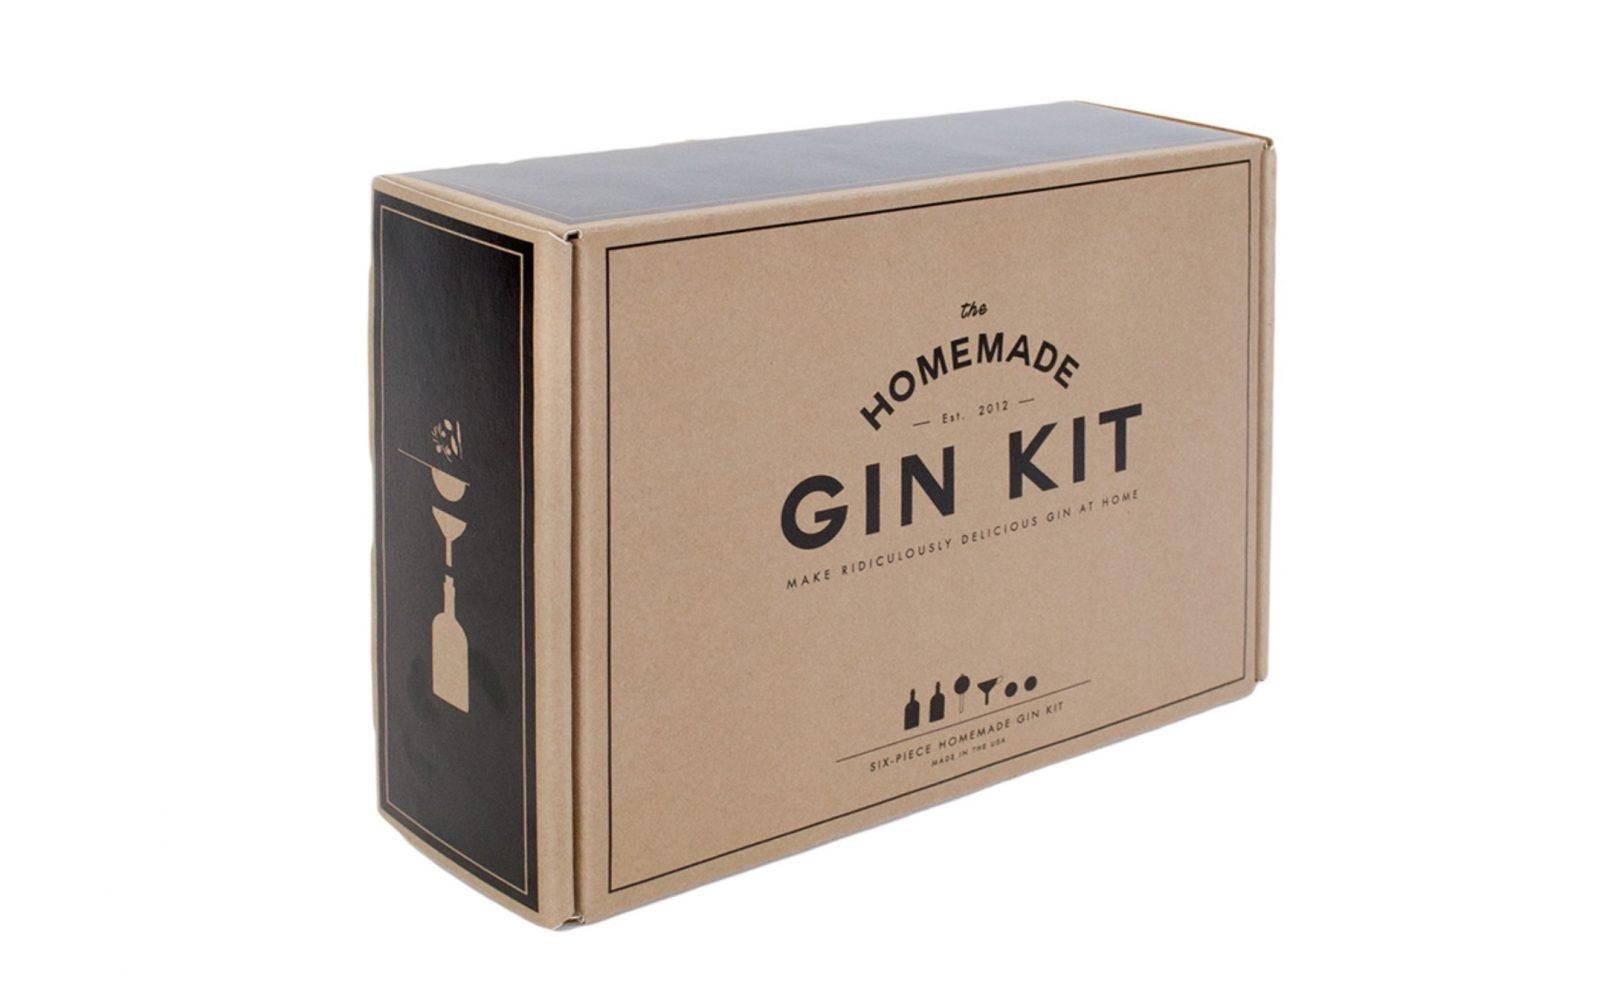 Homemade Gin Kit Box 1 1600x993 - The Homemade Gin Kit